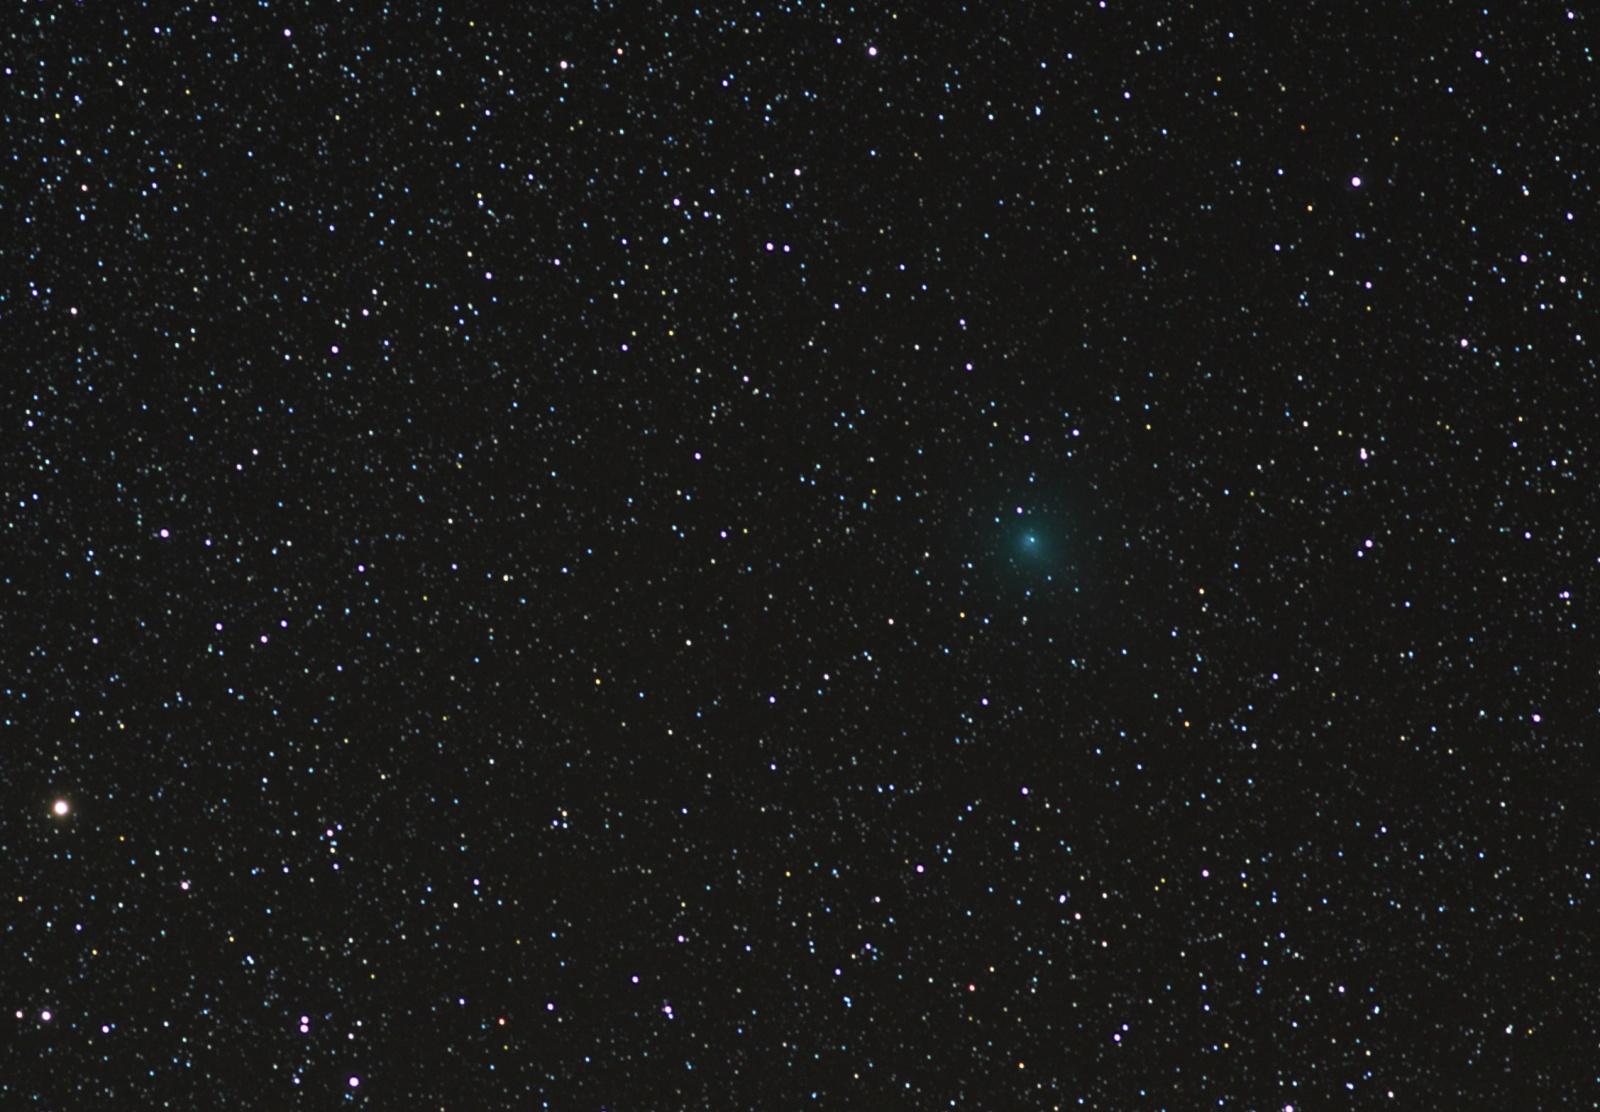 Kometa C2020 M3 Atlas 26XI2020 stack gwiazdowy.jpg